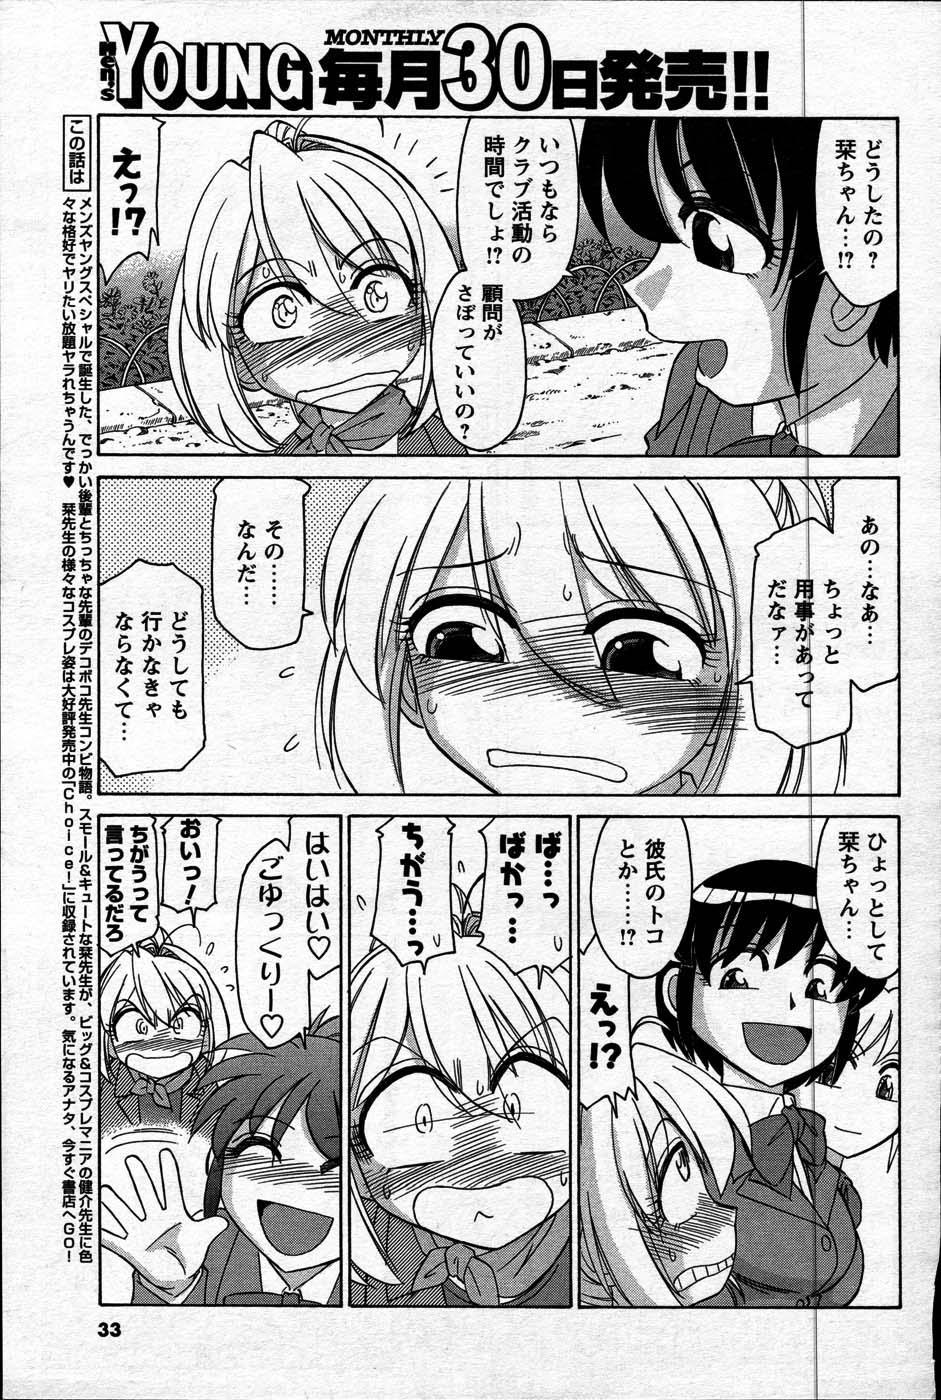 Comic Mens Young Special IKAZUCHI vol. 2 30